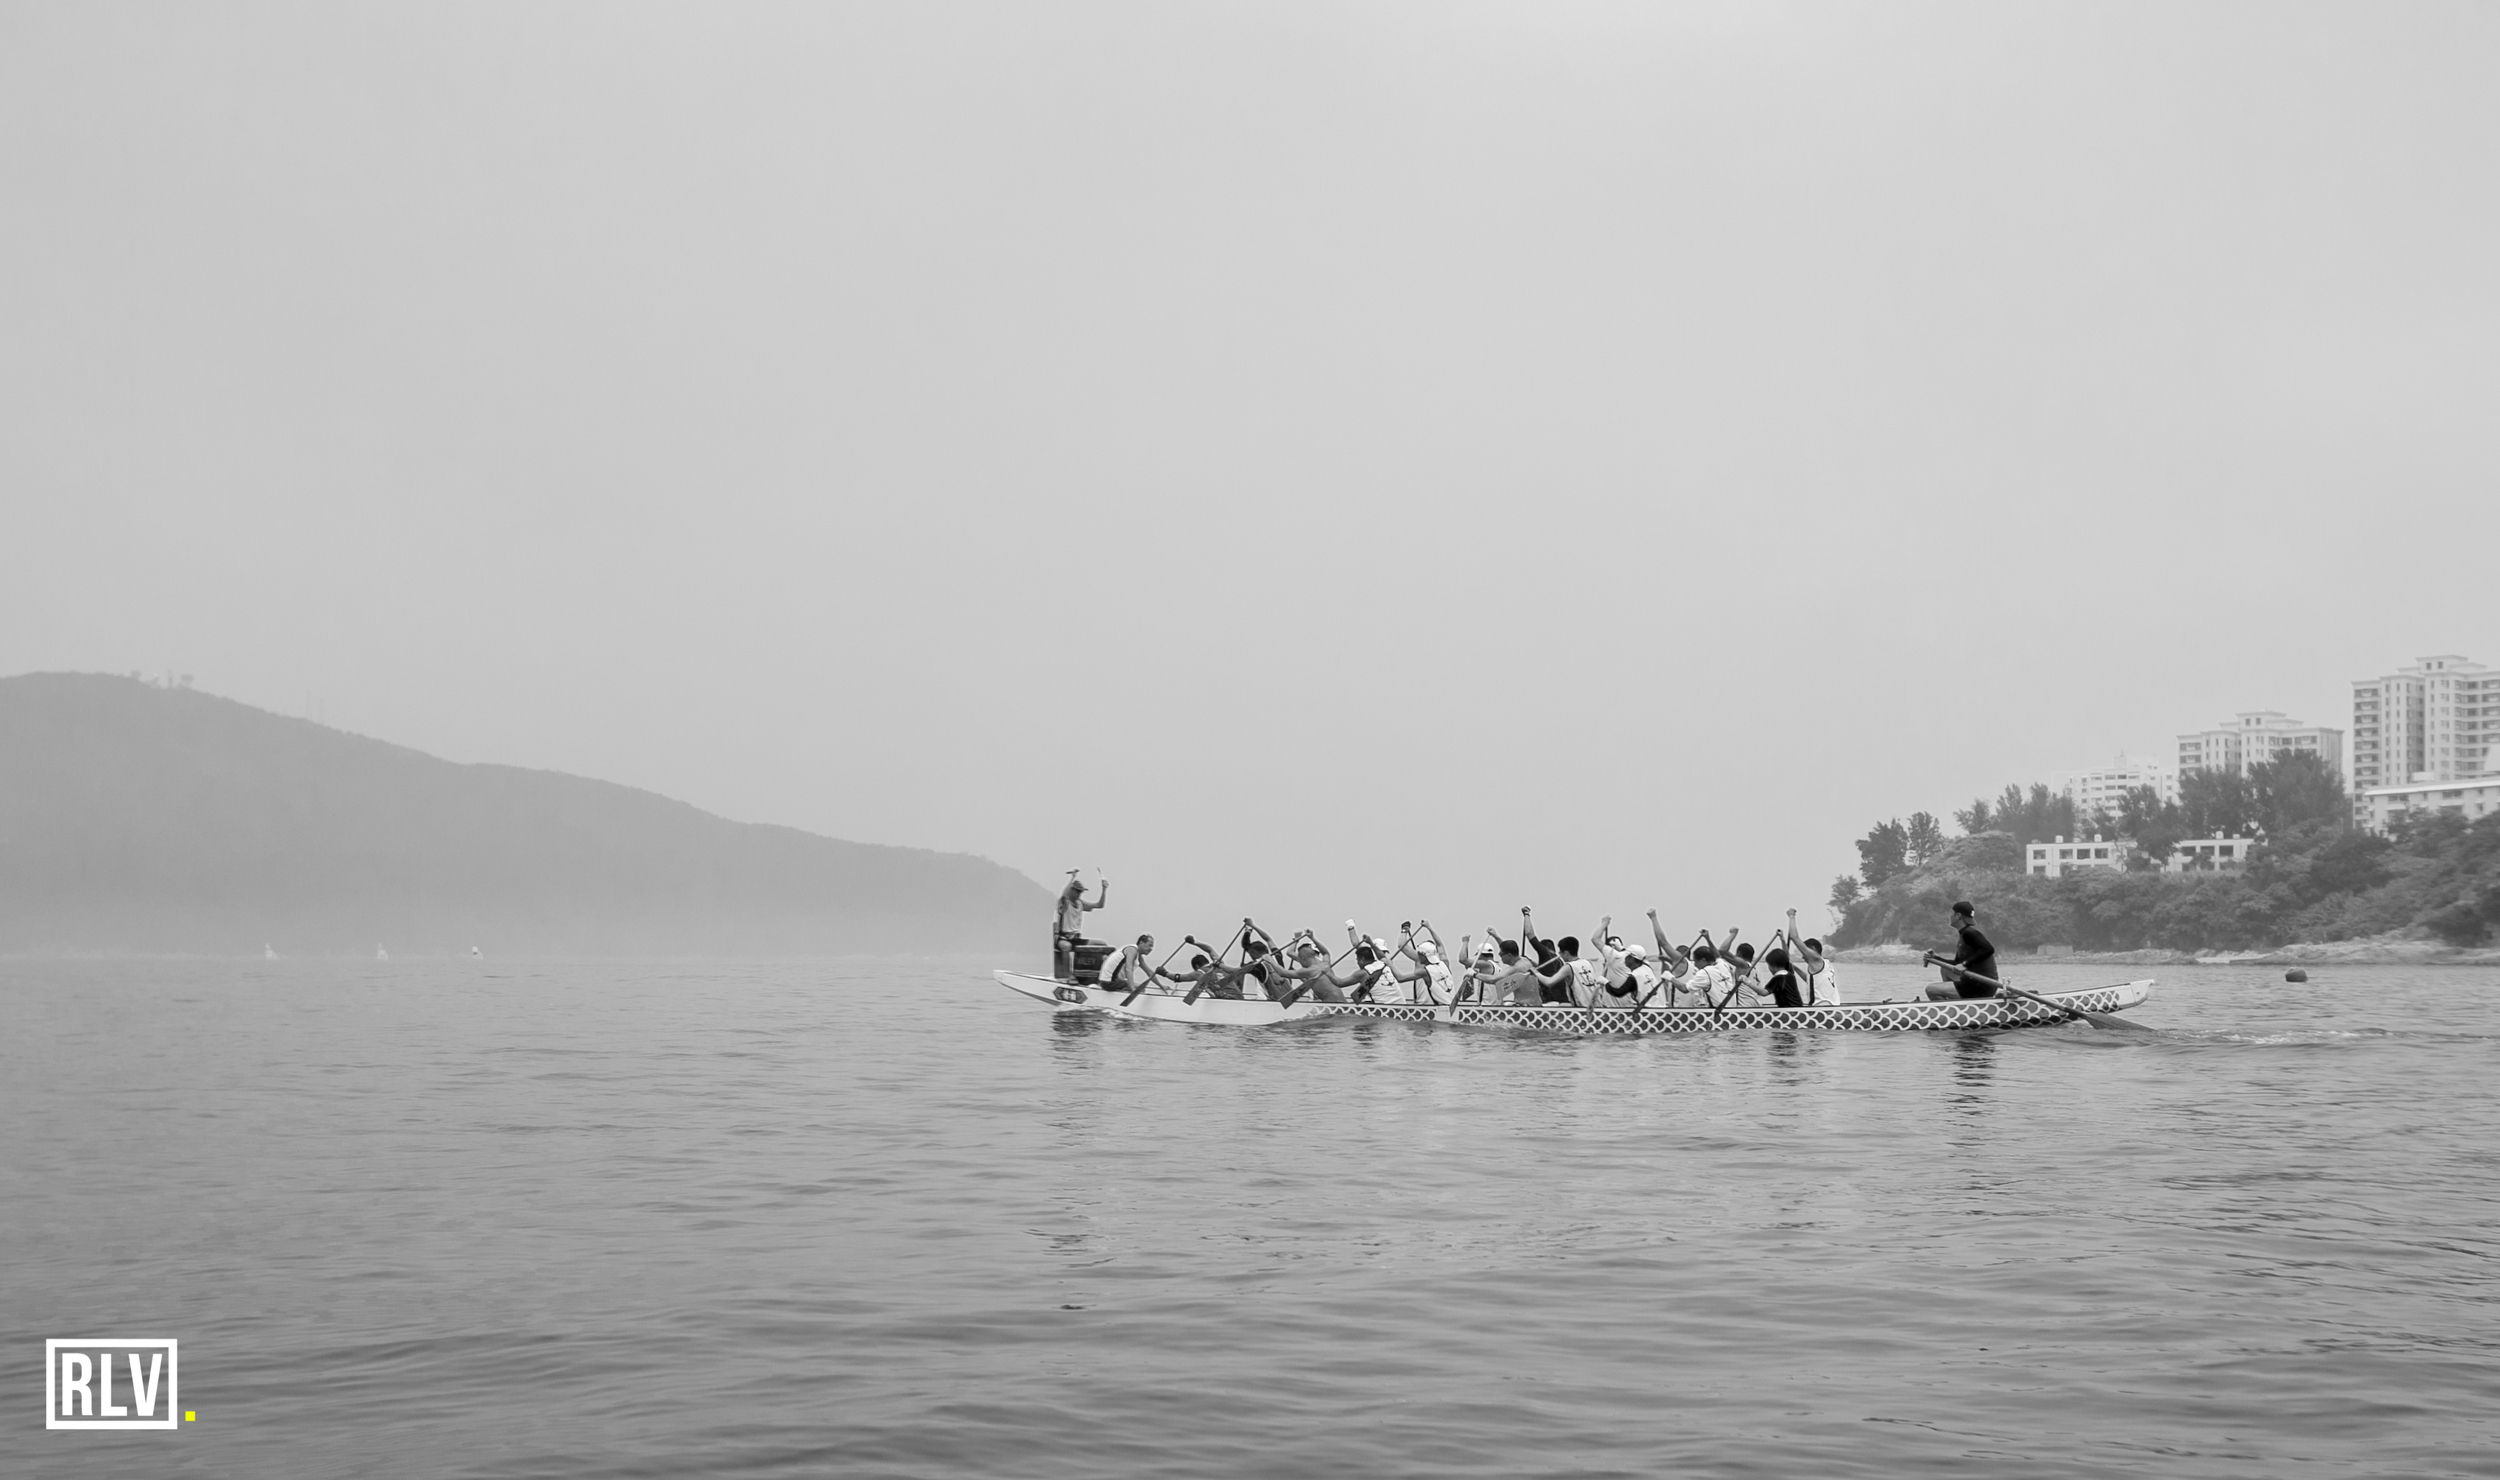 Local HK dragon boat team training